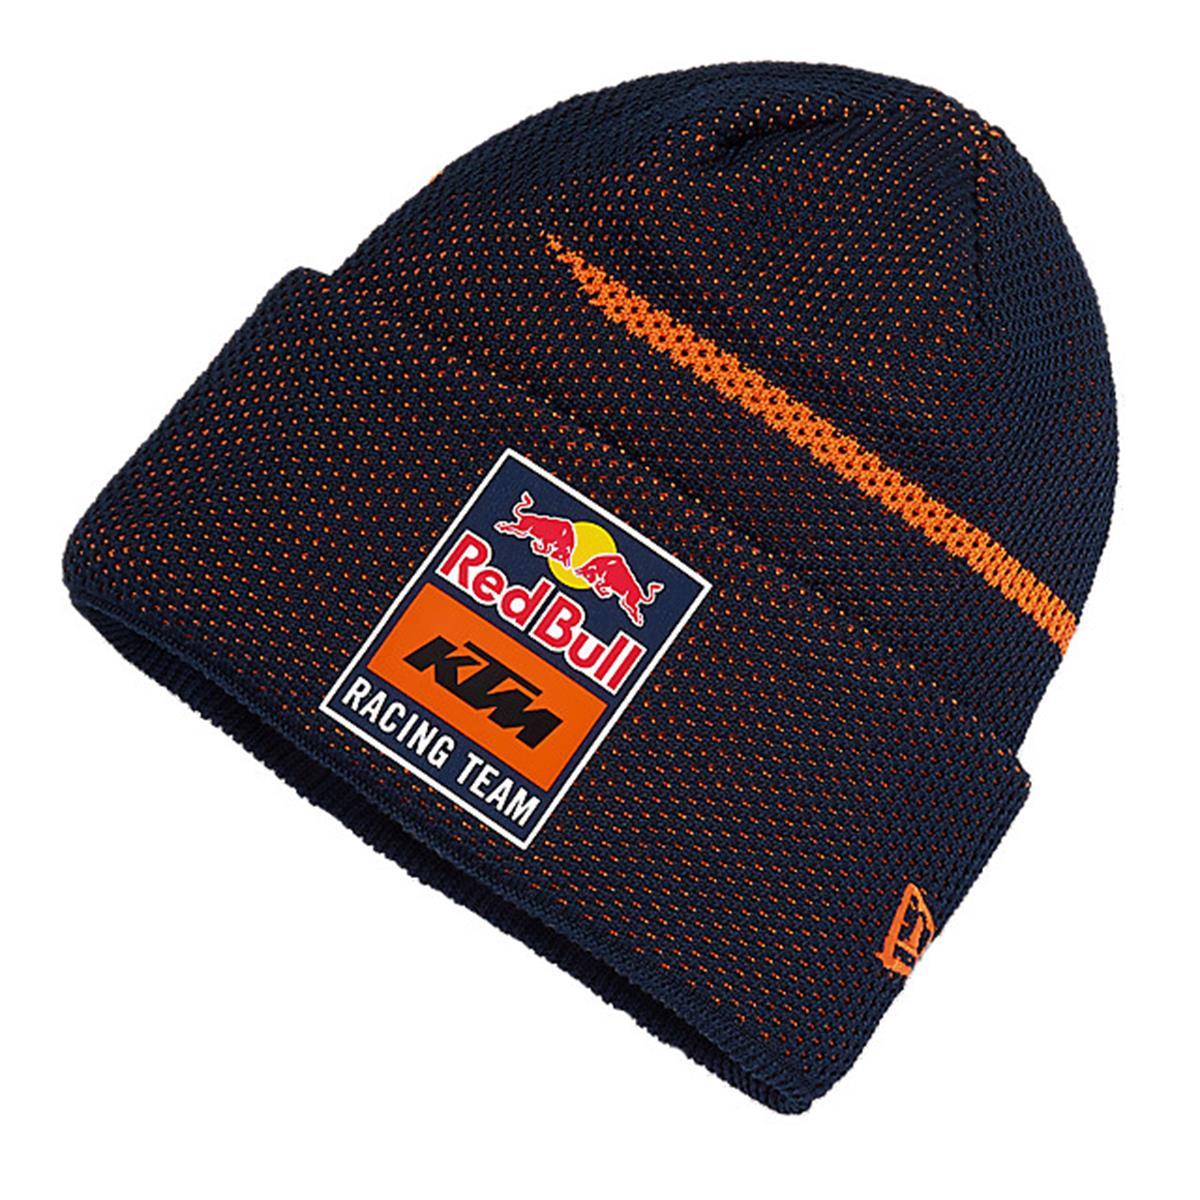 Red Bull Beanie KTM New Era Navy